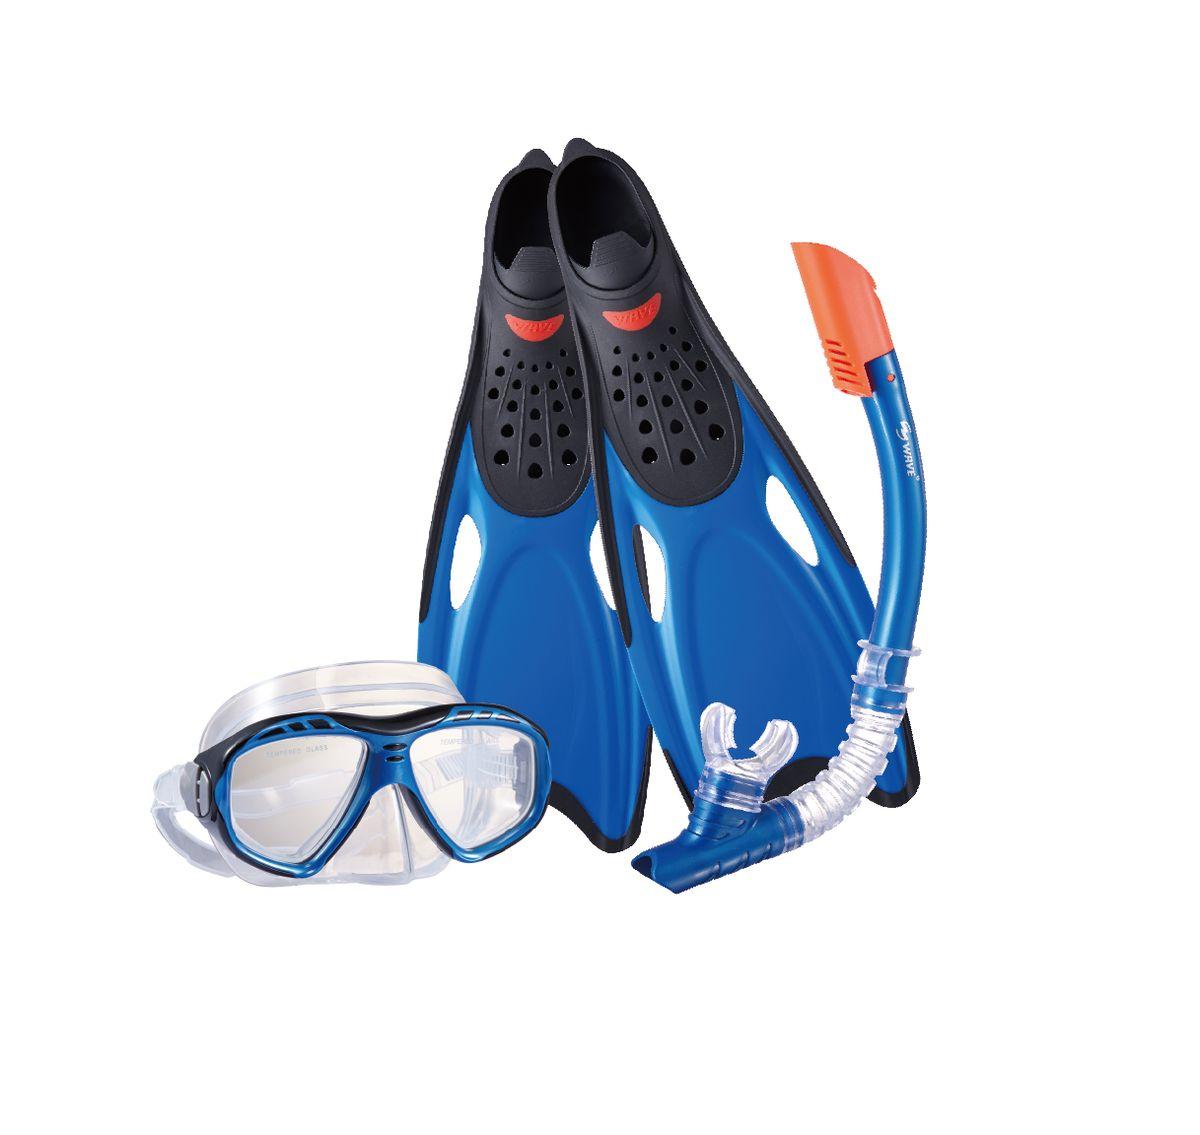 Комплект для плавания WAVE: маска, трубка, ласты, цвет: синий. Размер 40-41. MSF-1396S25BF71 ласты для плавания wave р 40 41 серые f 6871